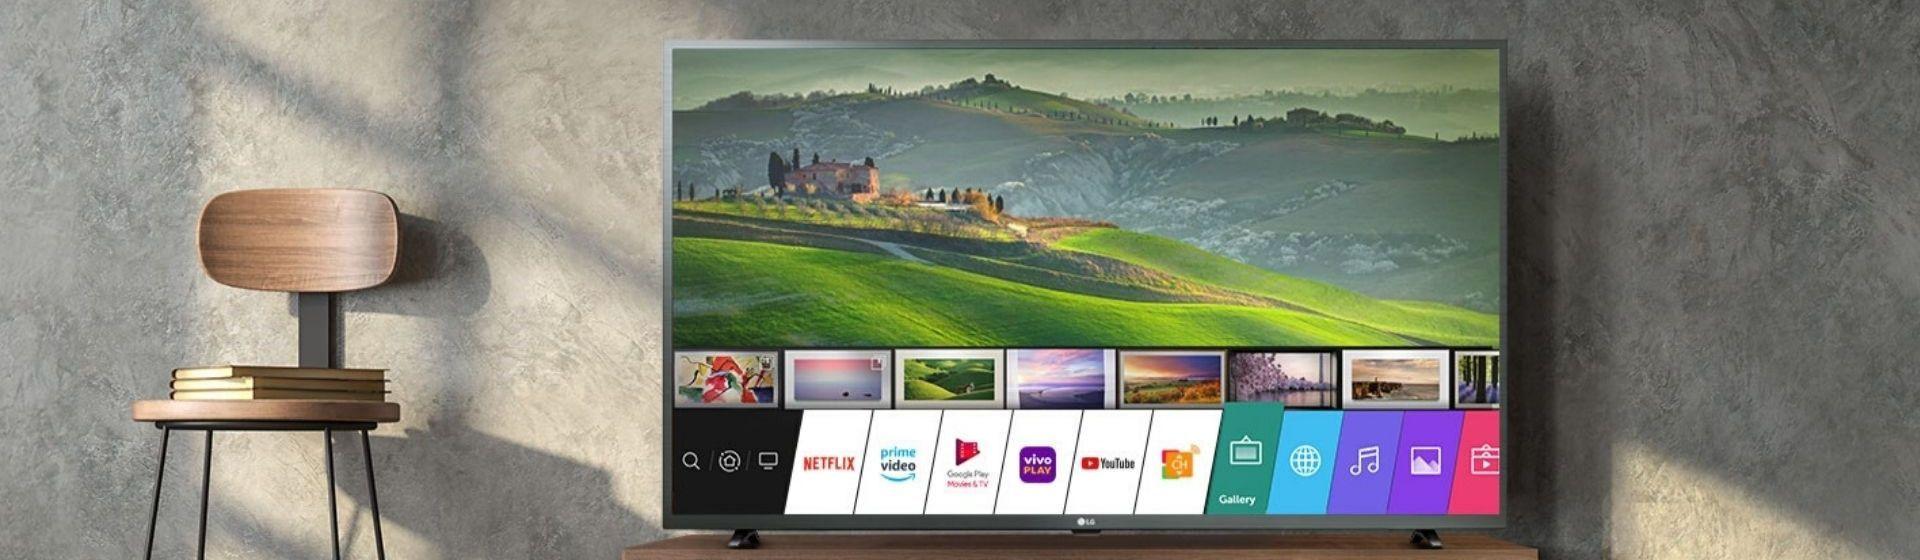 Como conectar Android na TV LG